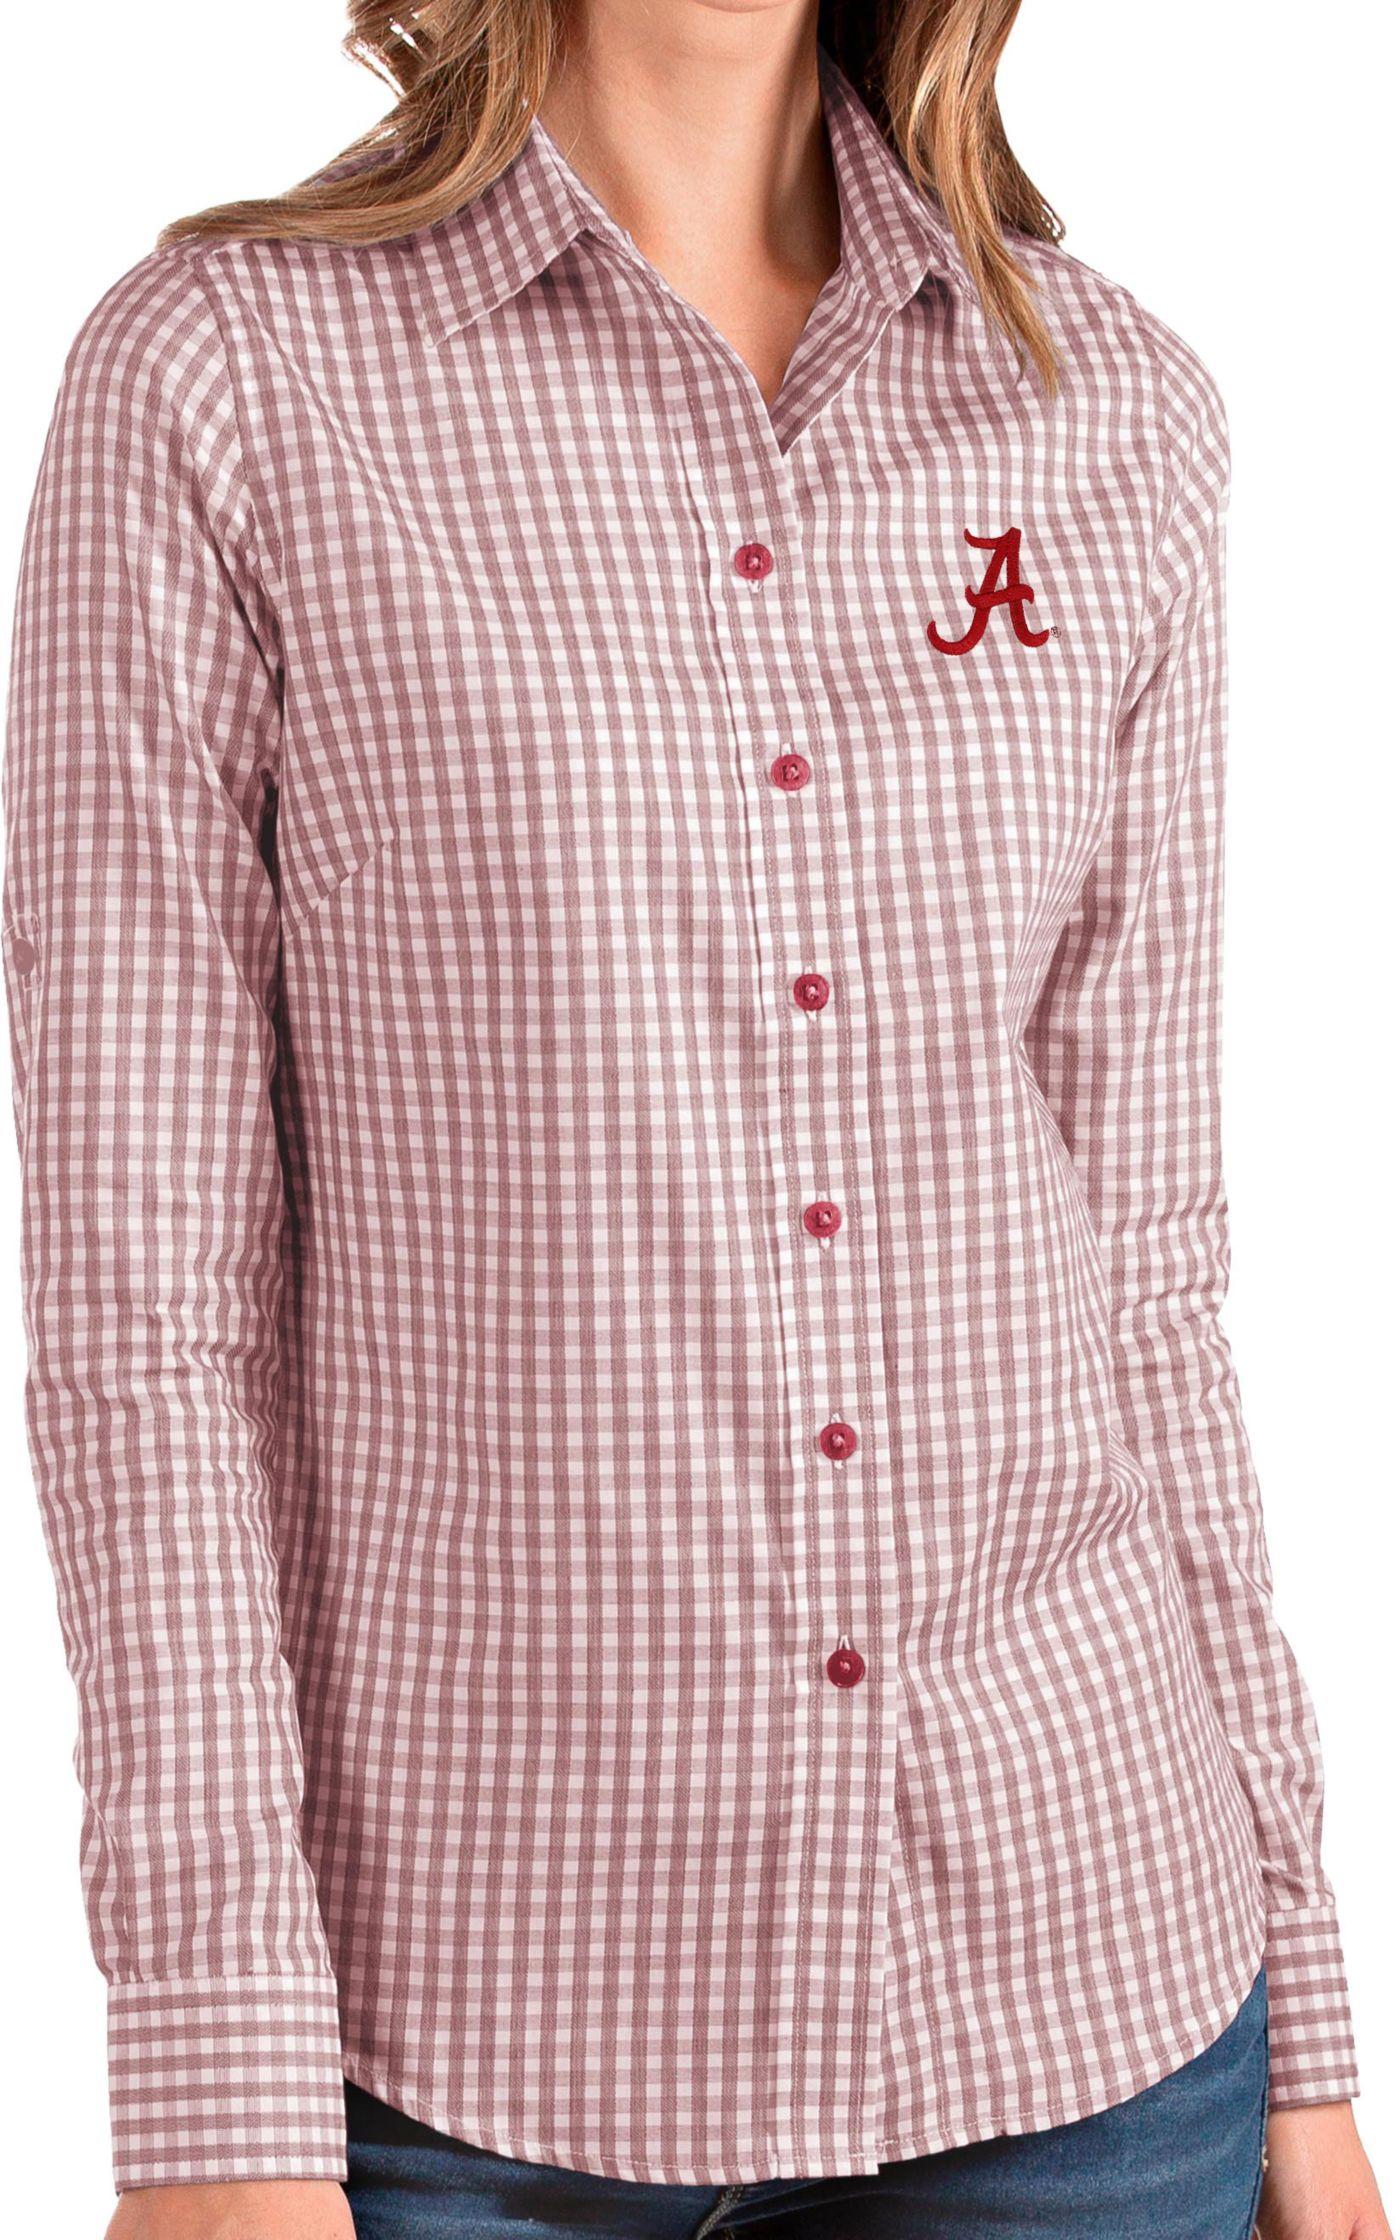 Antigua Women's Alabama Crimson Tide Crimson Structure Button Down Long Sleeve Shirt